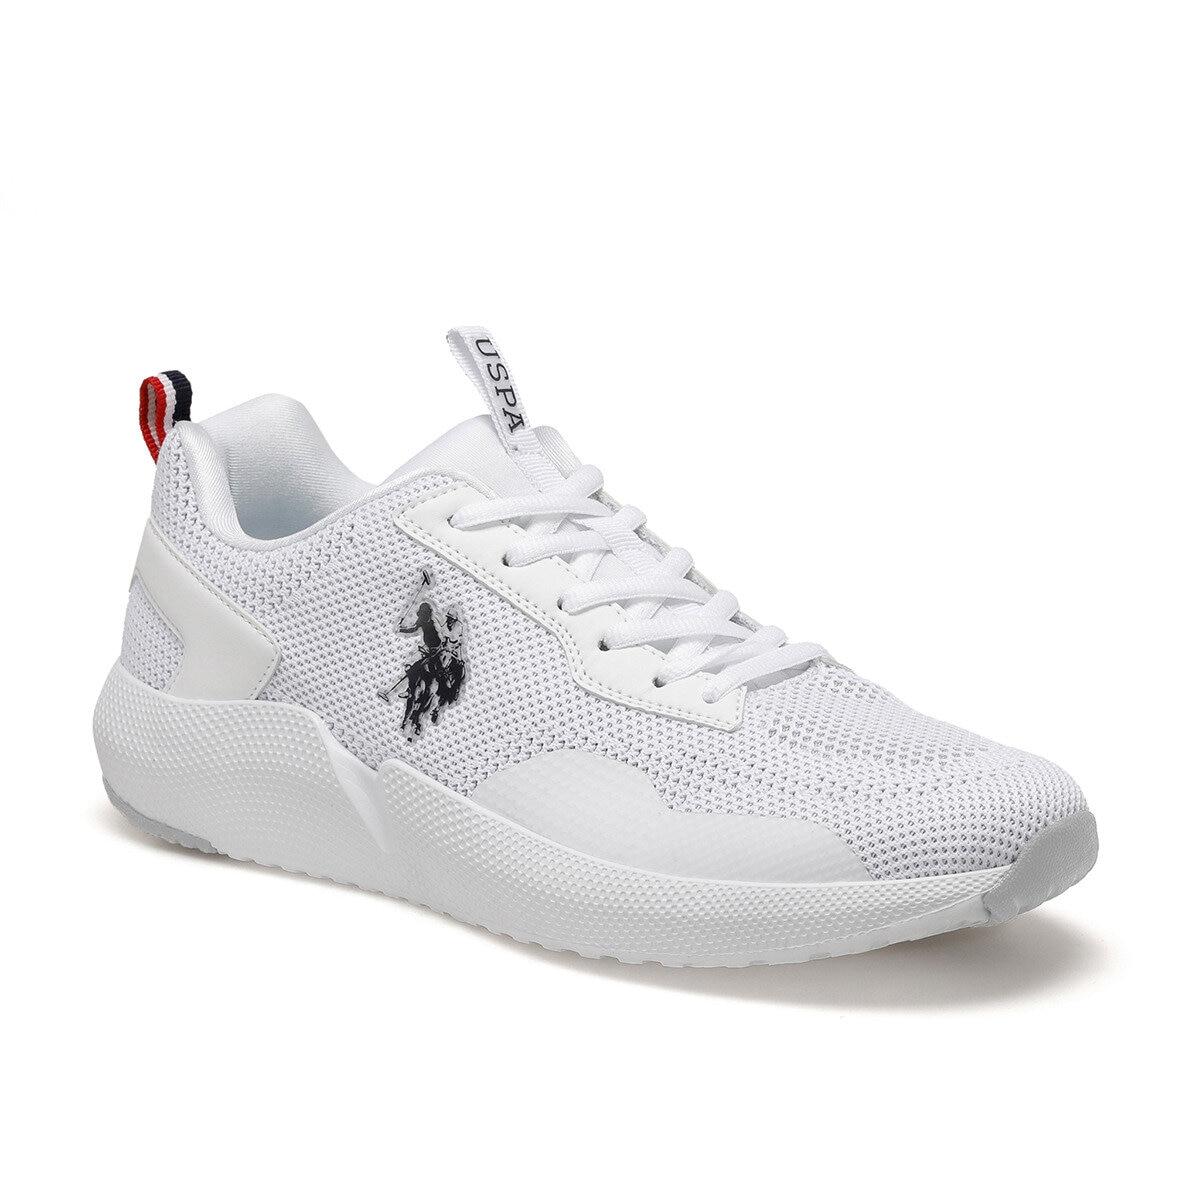 ¡FLO blanco zapatilla de deporte de los hombres zapatos casuales zapatos de hombre Trekking al aire libre zapatos de Montañismo de Estados Unidos POLO ASSN! SAM